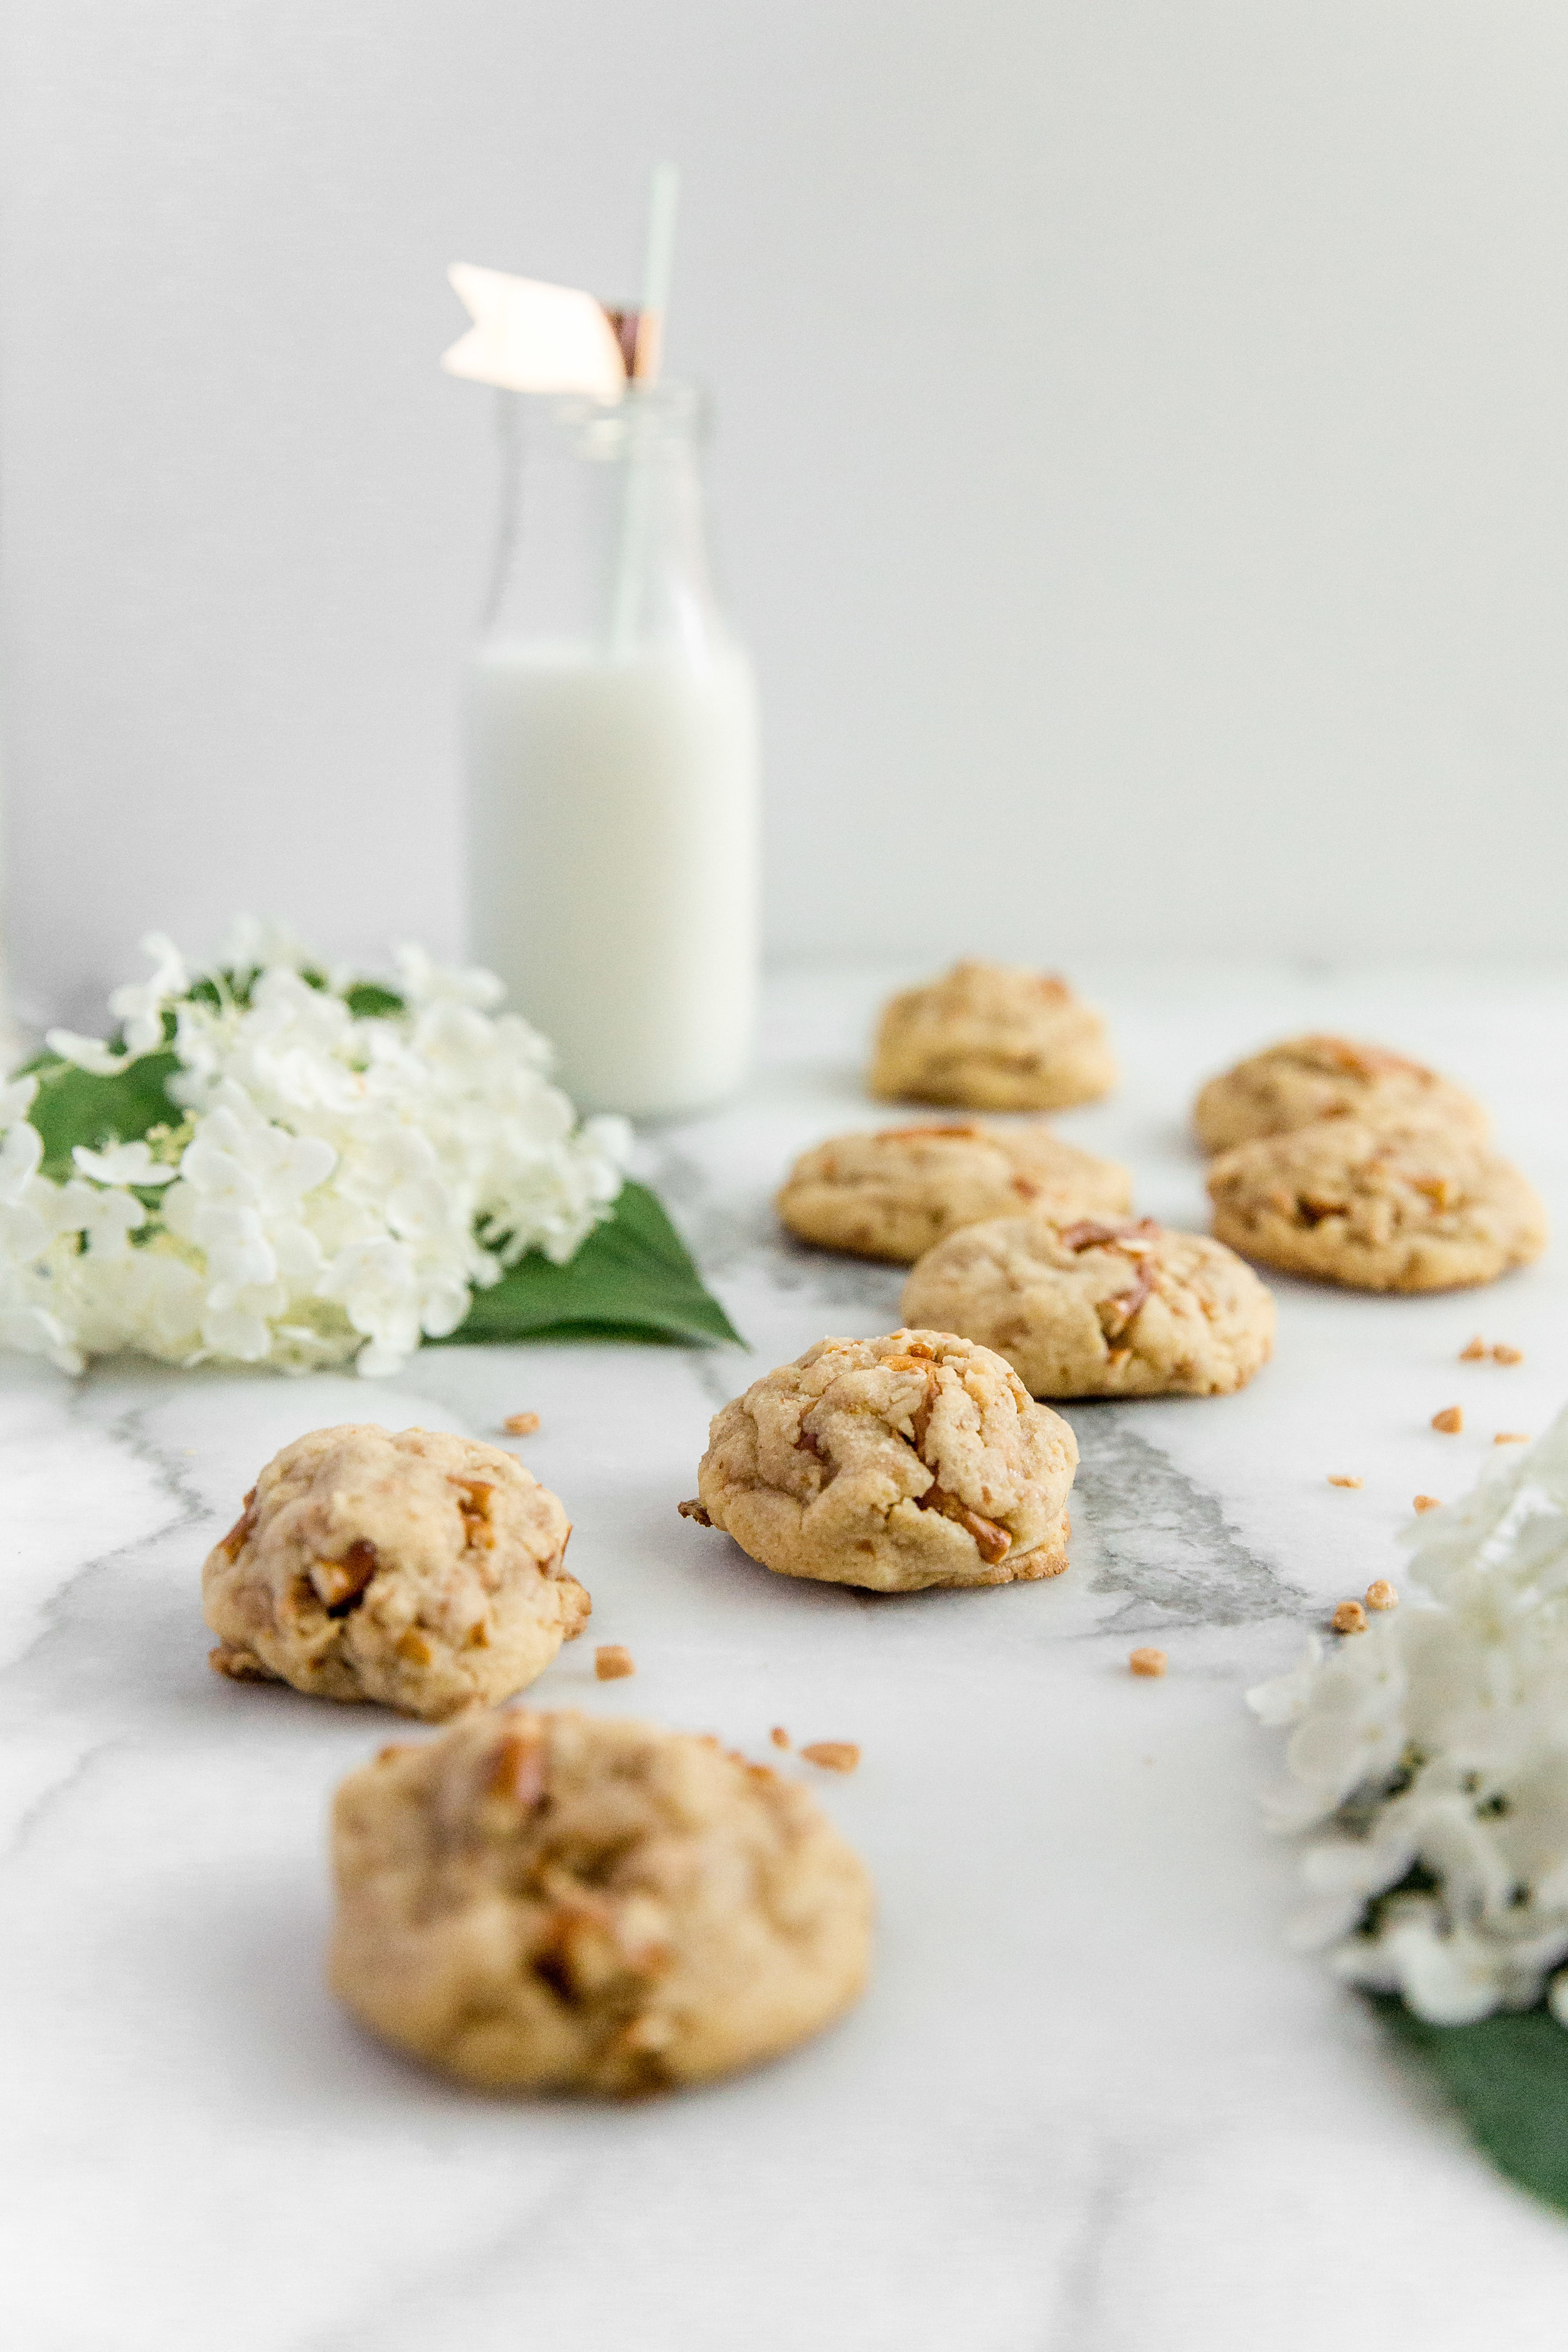 pretezel-english-toffee-cookies-6.jpg